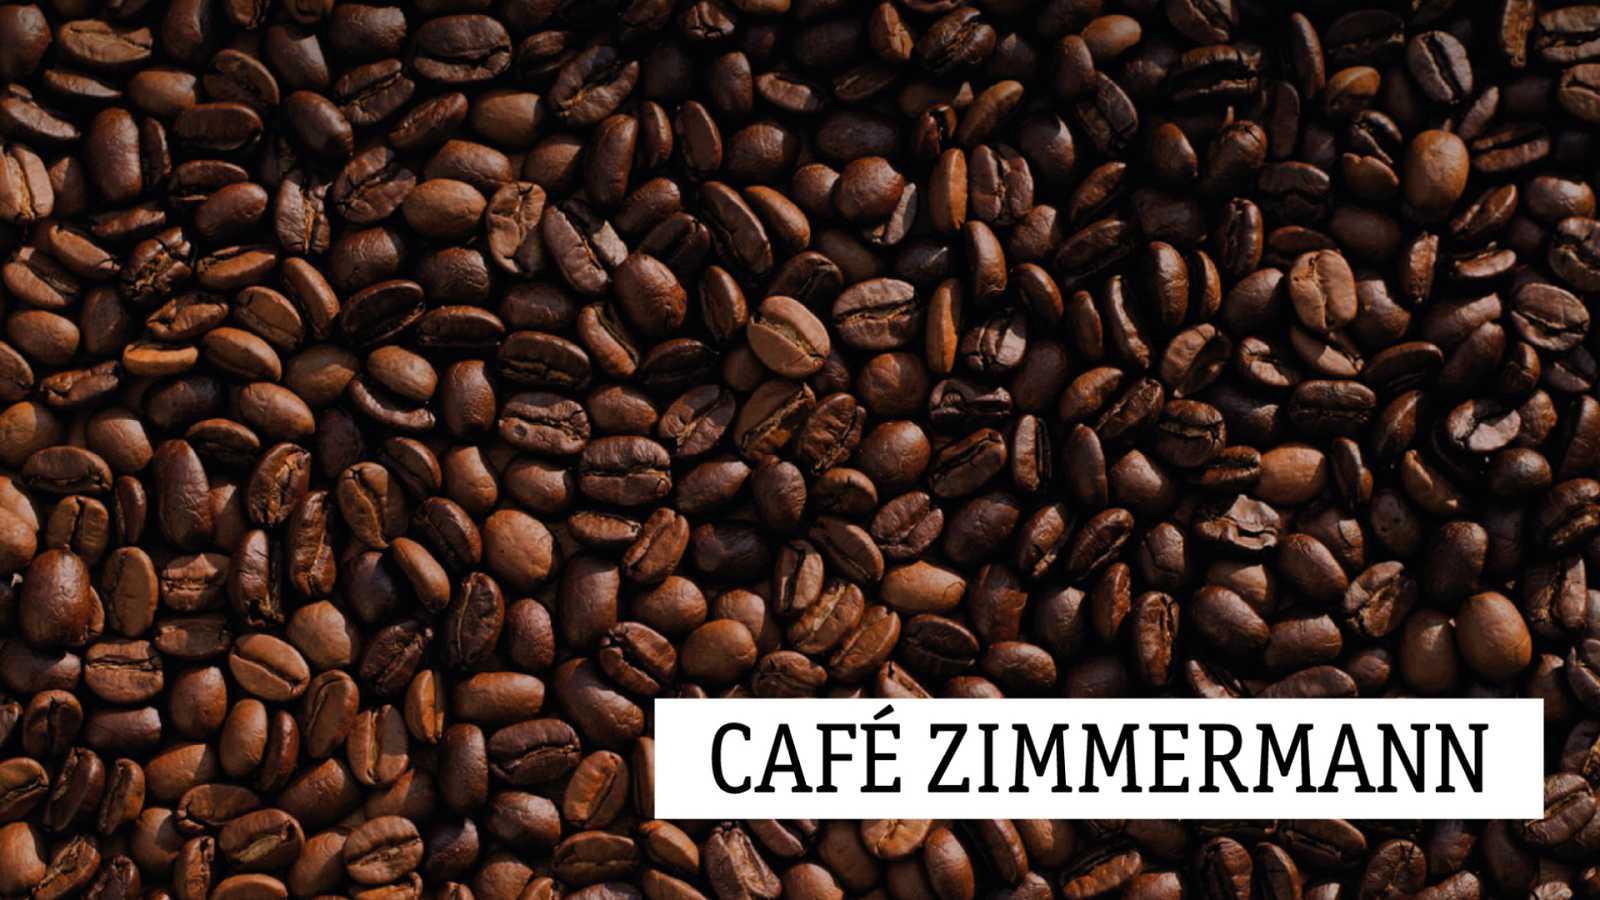 Café Zimmermann - Expreso a Praga - 26/04/21 - ESCUCHAR AHORA